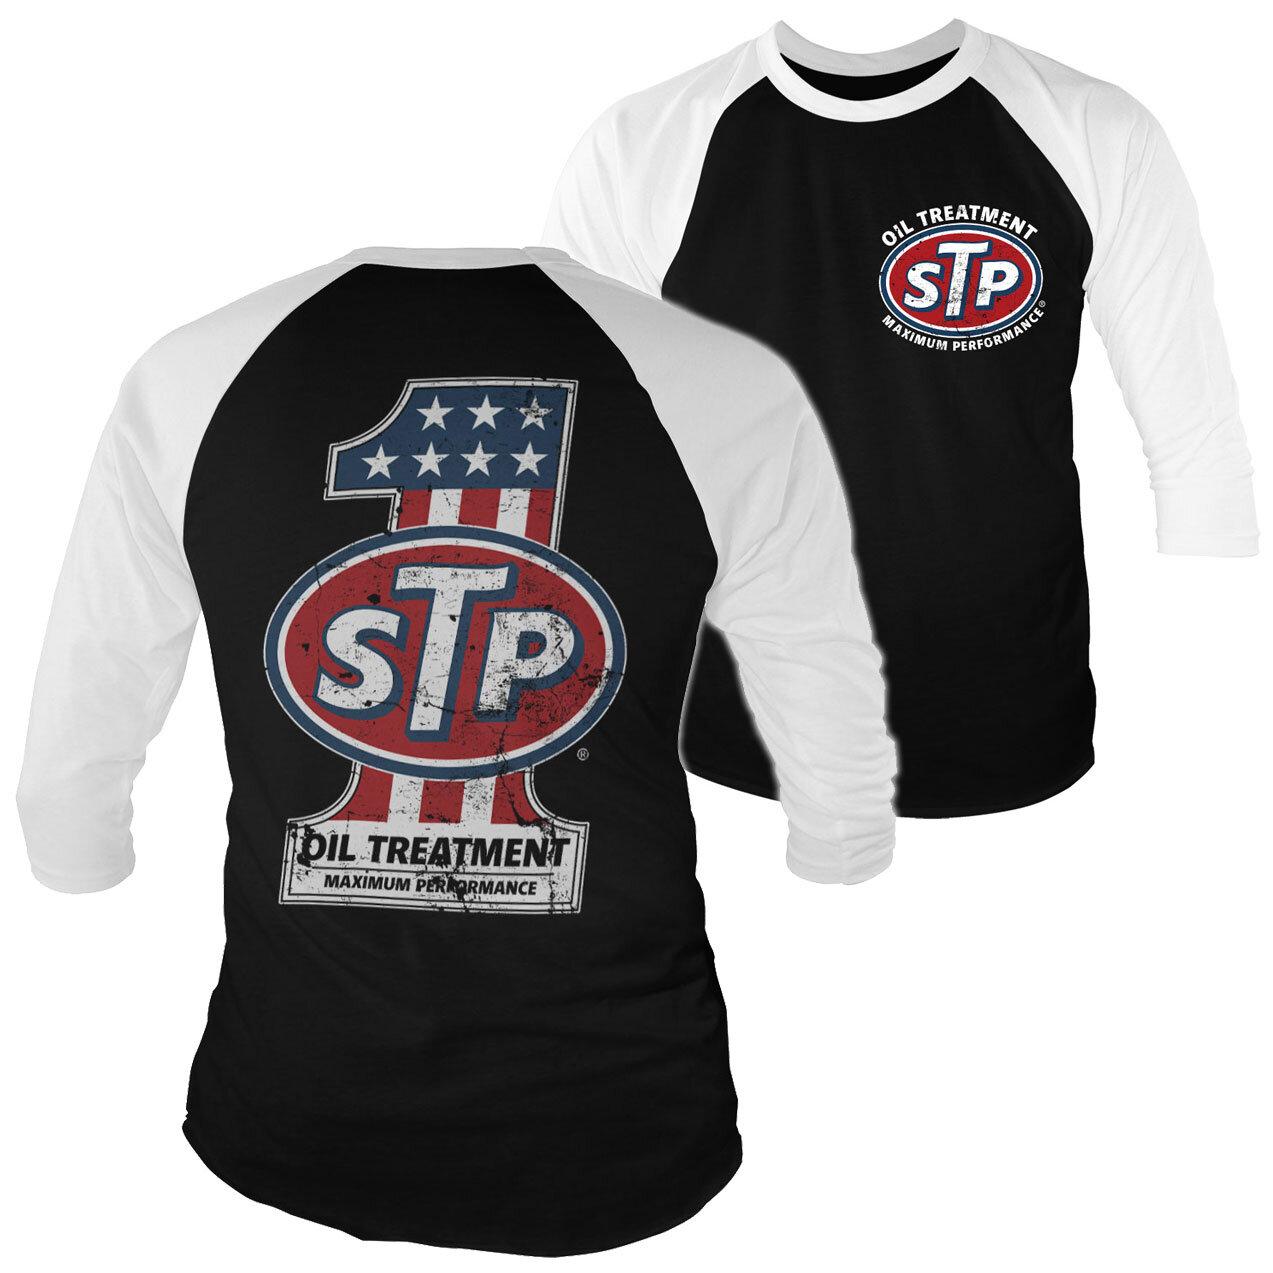 STP American No. 1 Baseball 3/4 Sleeve Tee